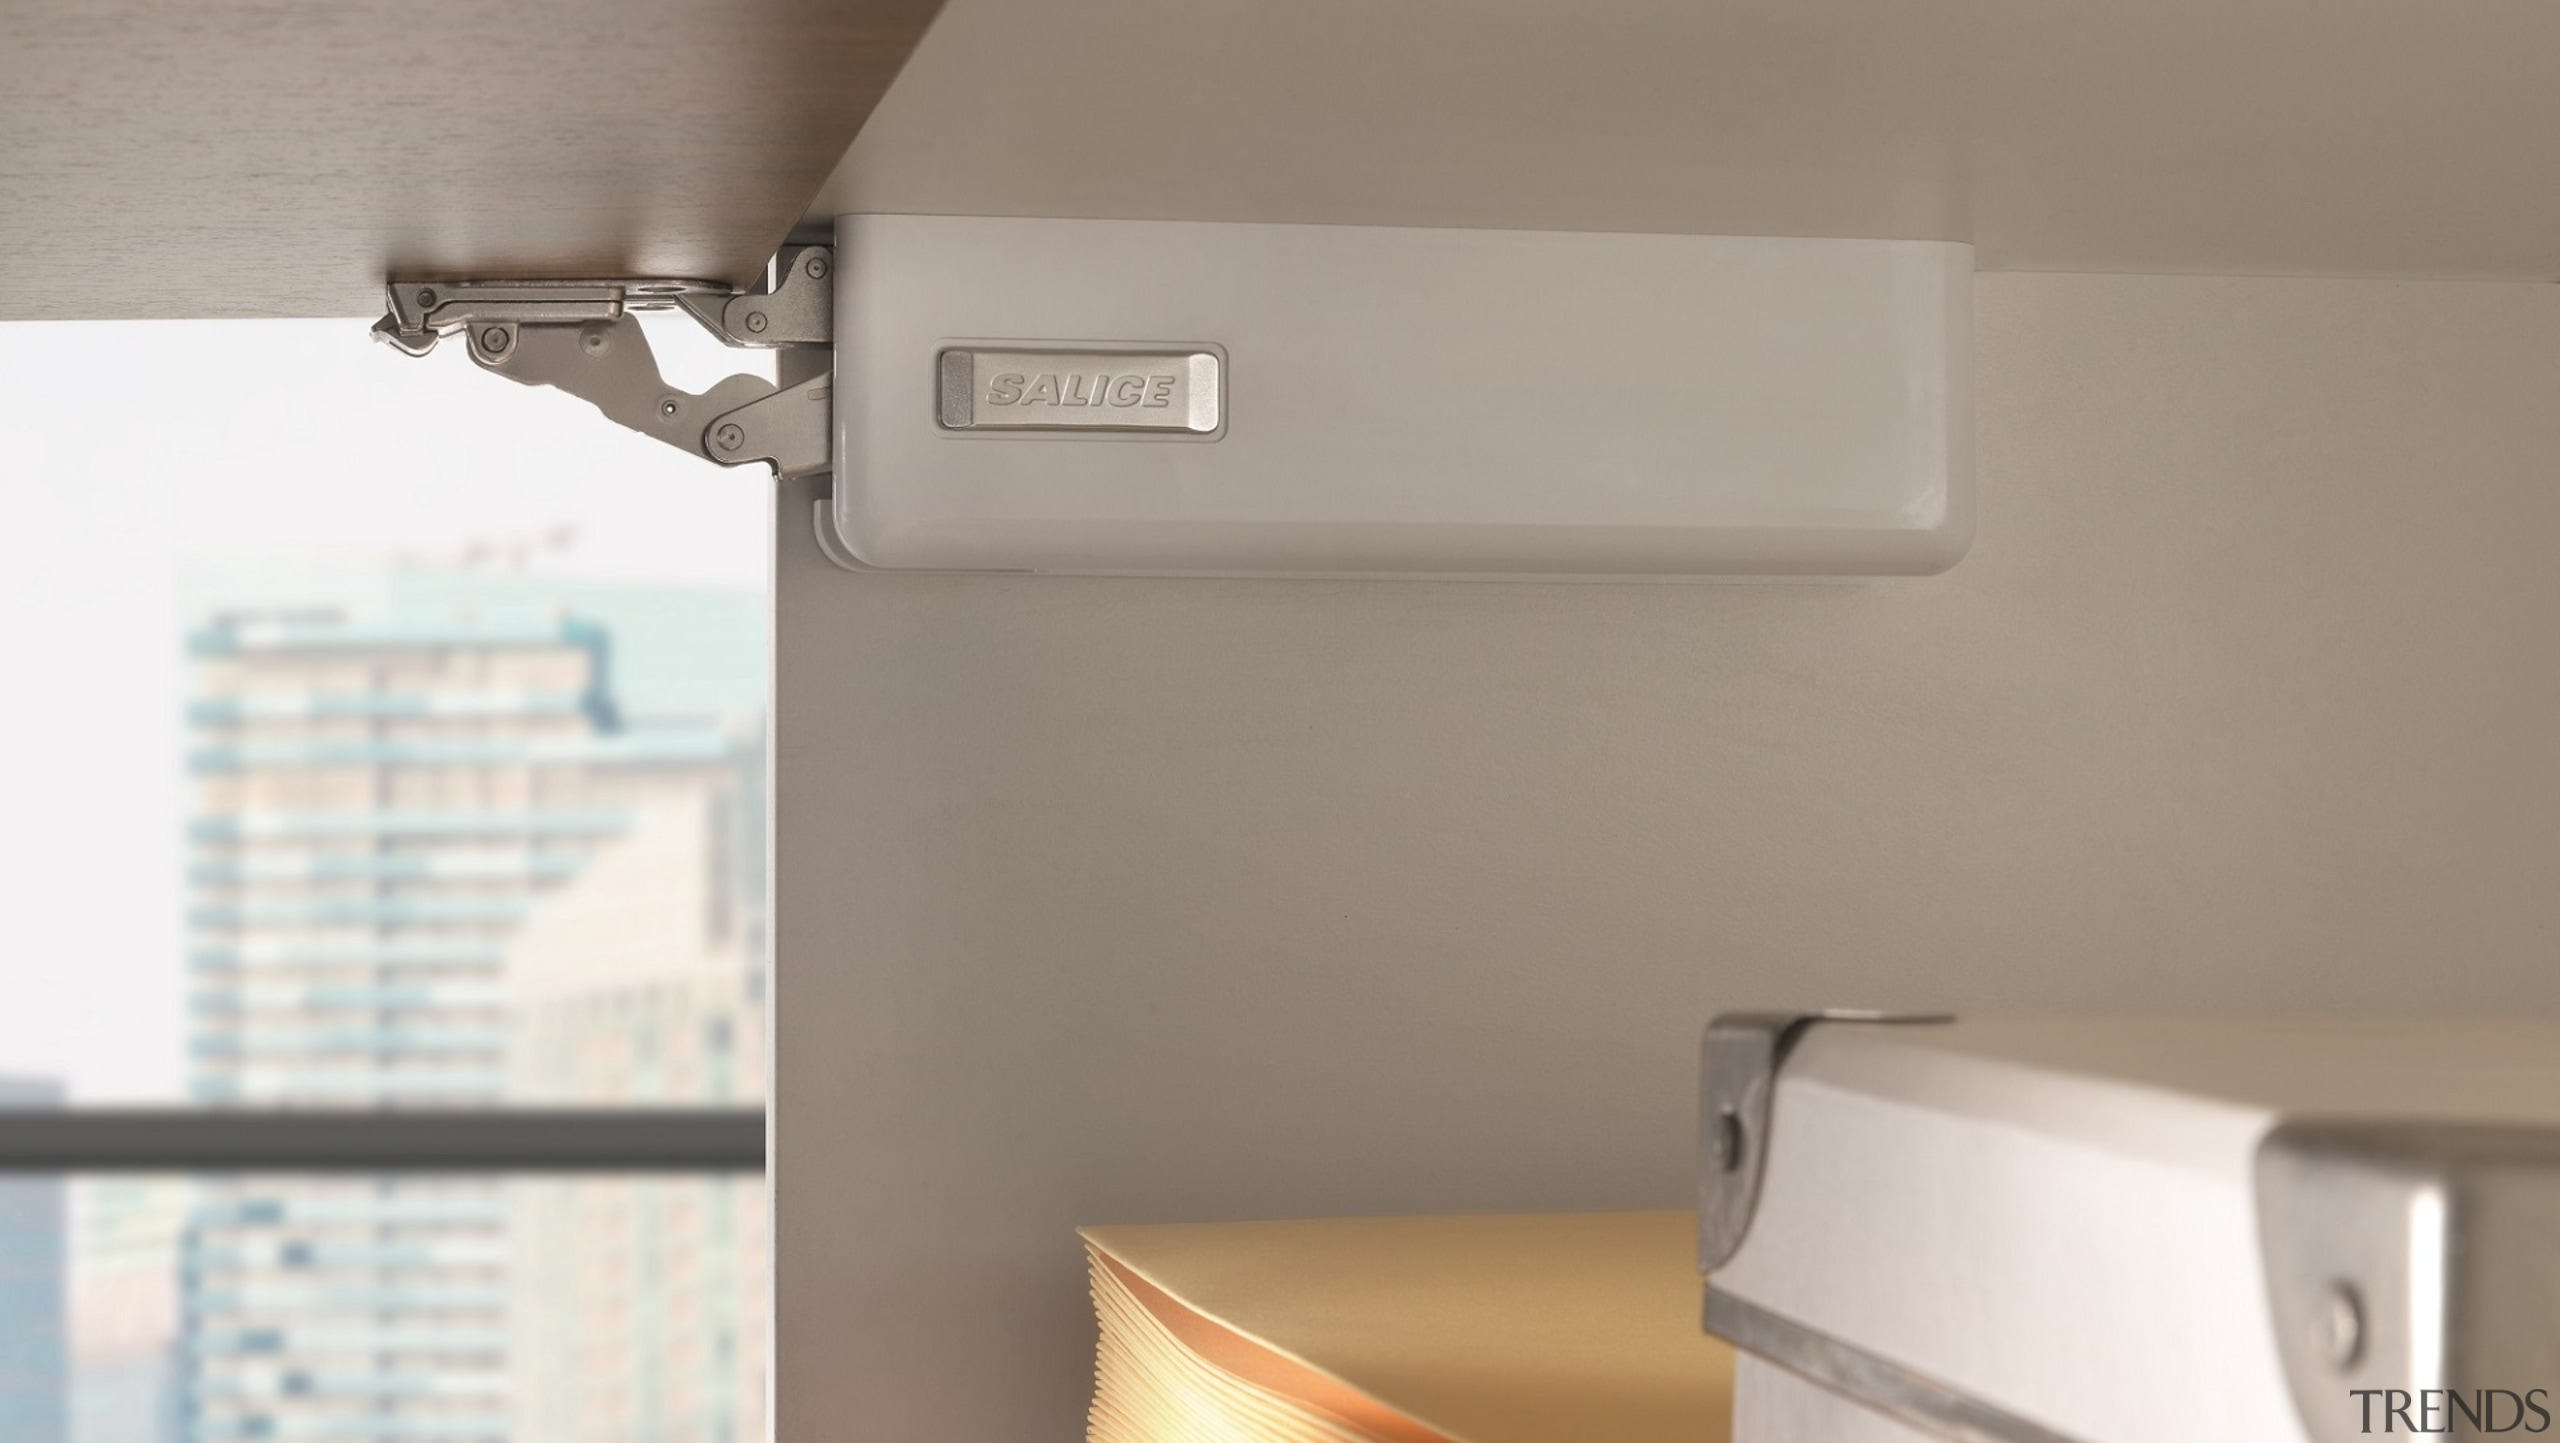 Salice's Wind is an elegant, unobtrusive overhead lift lighting, product, gray